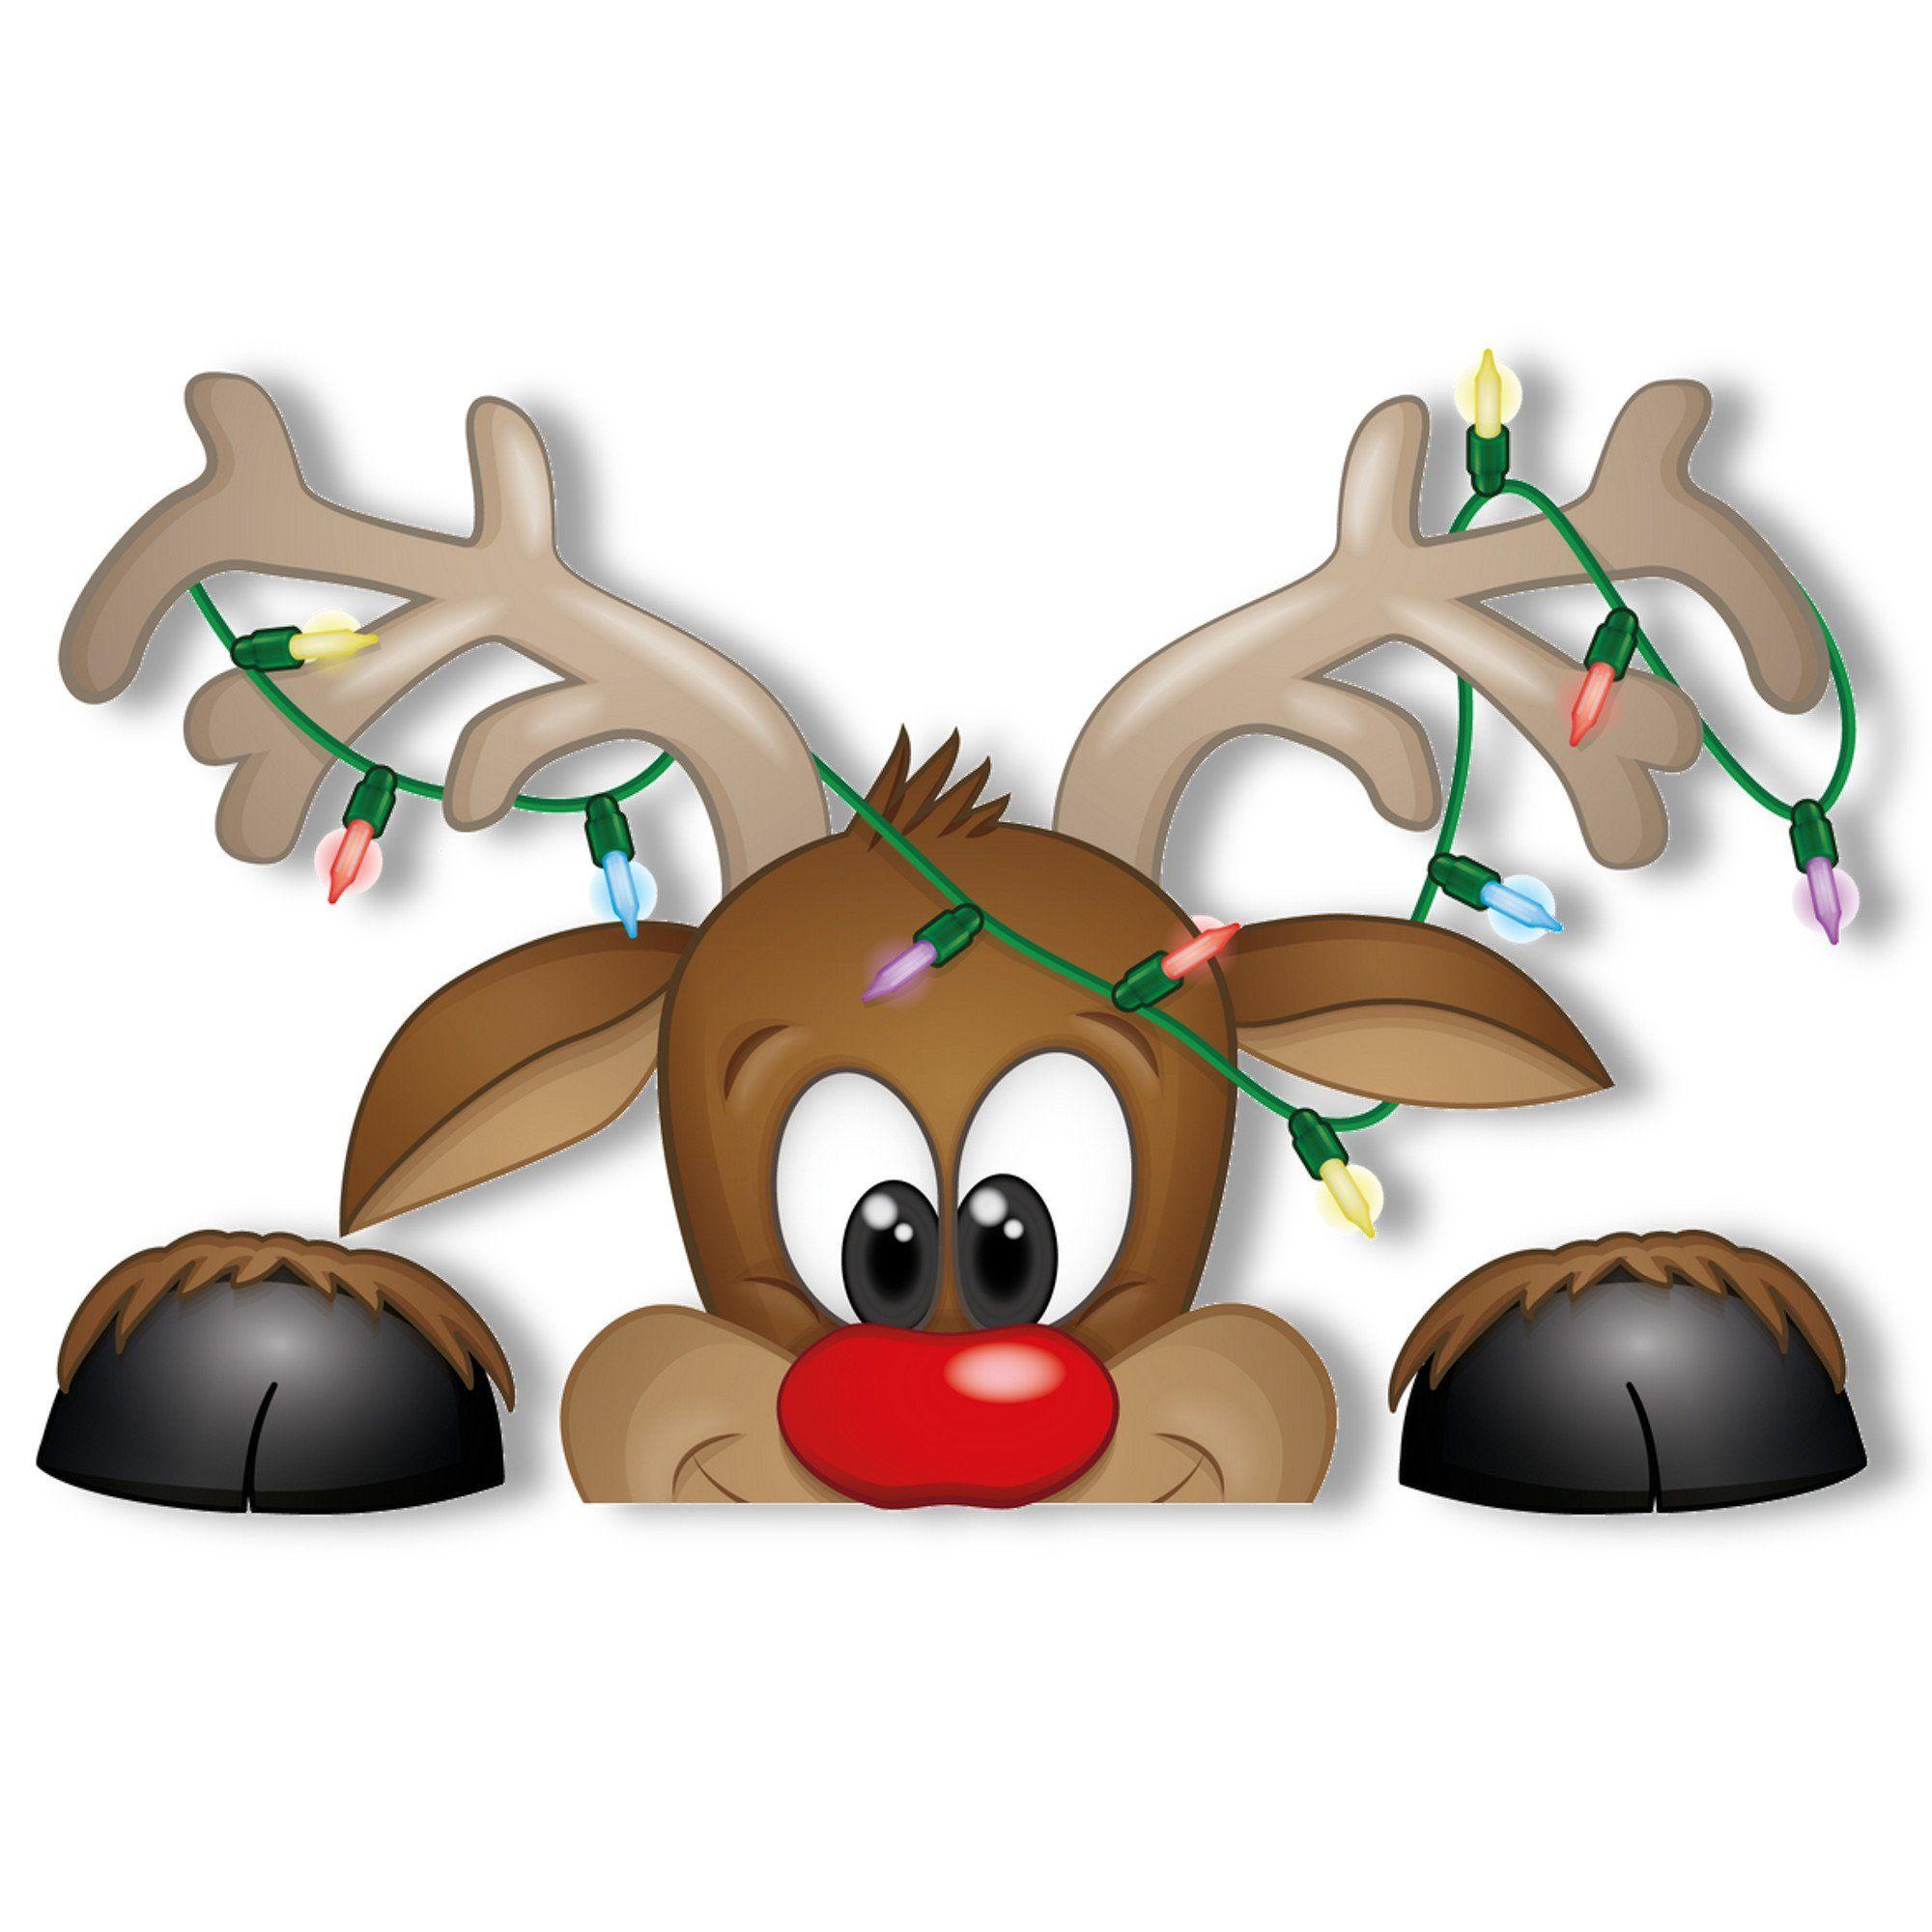 Peeking Santa and Rudolph Window Clings - With 28 ... (2000 x 2000 Pixel)